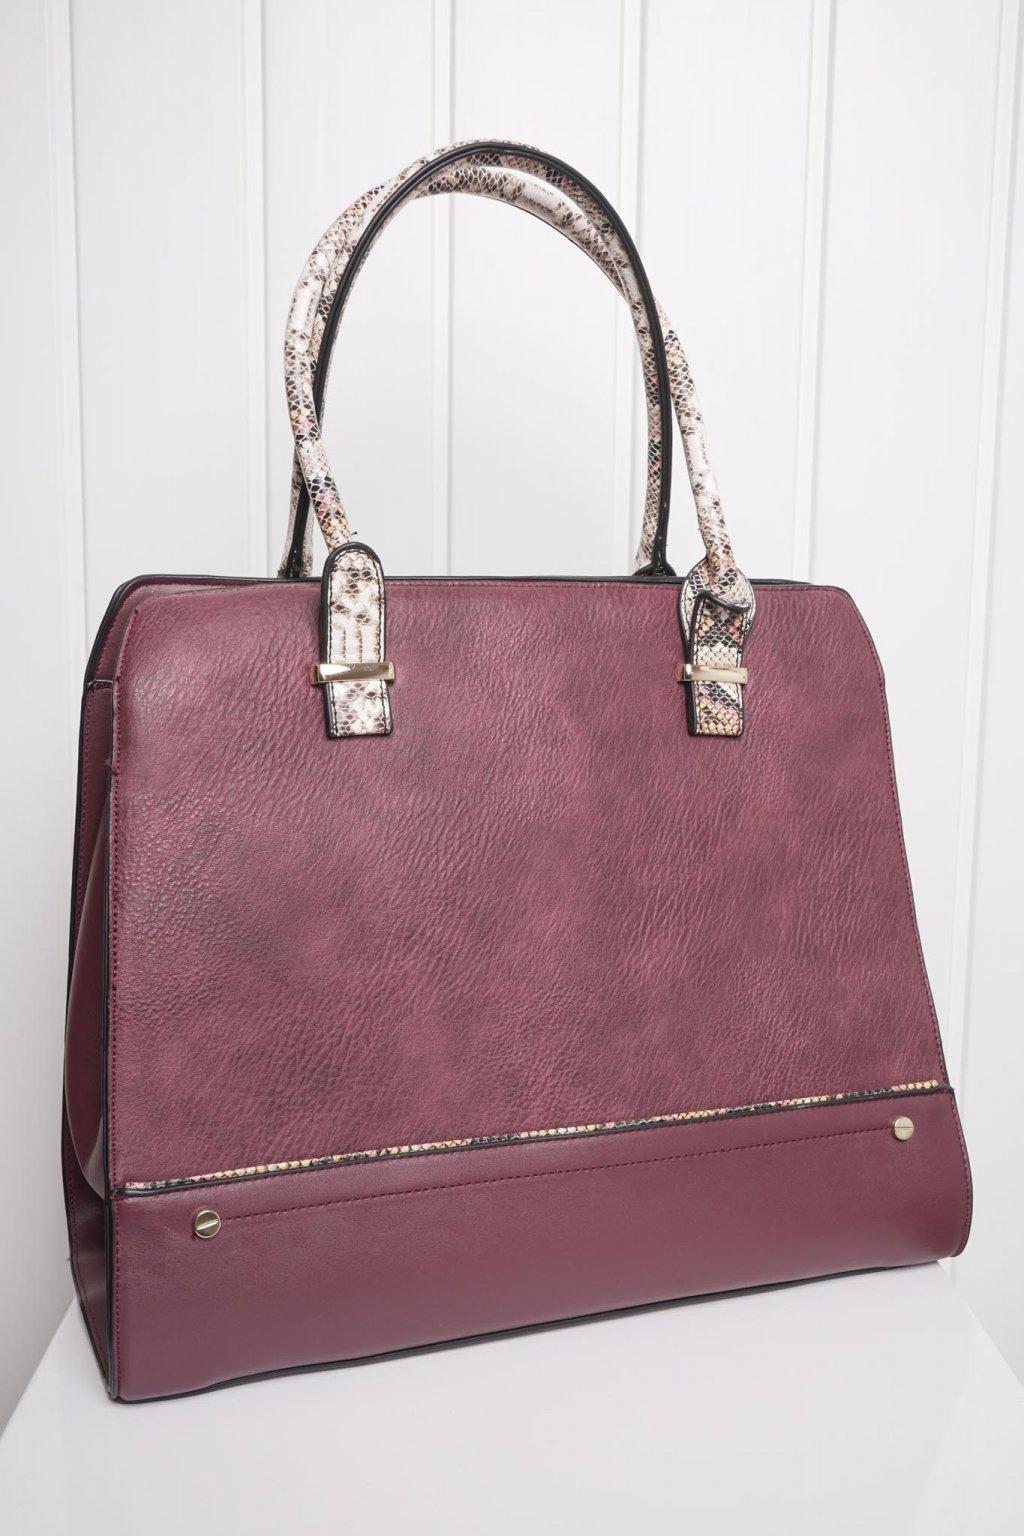 Kabelka, ruksak, dobrá cena, čierna kabelka, čierny ruksak, basic, kabelky, ruksaky 150